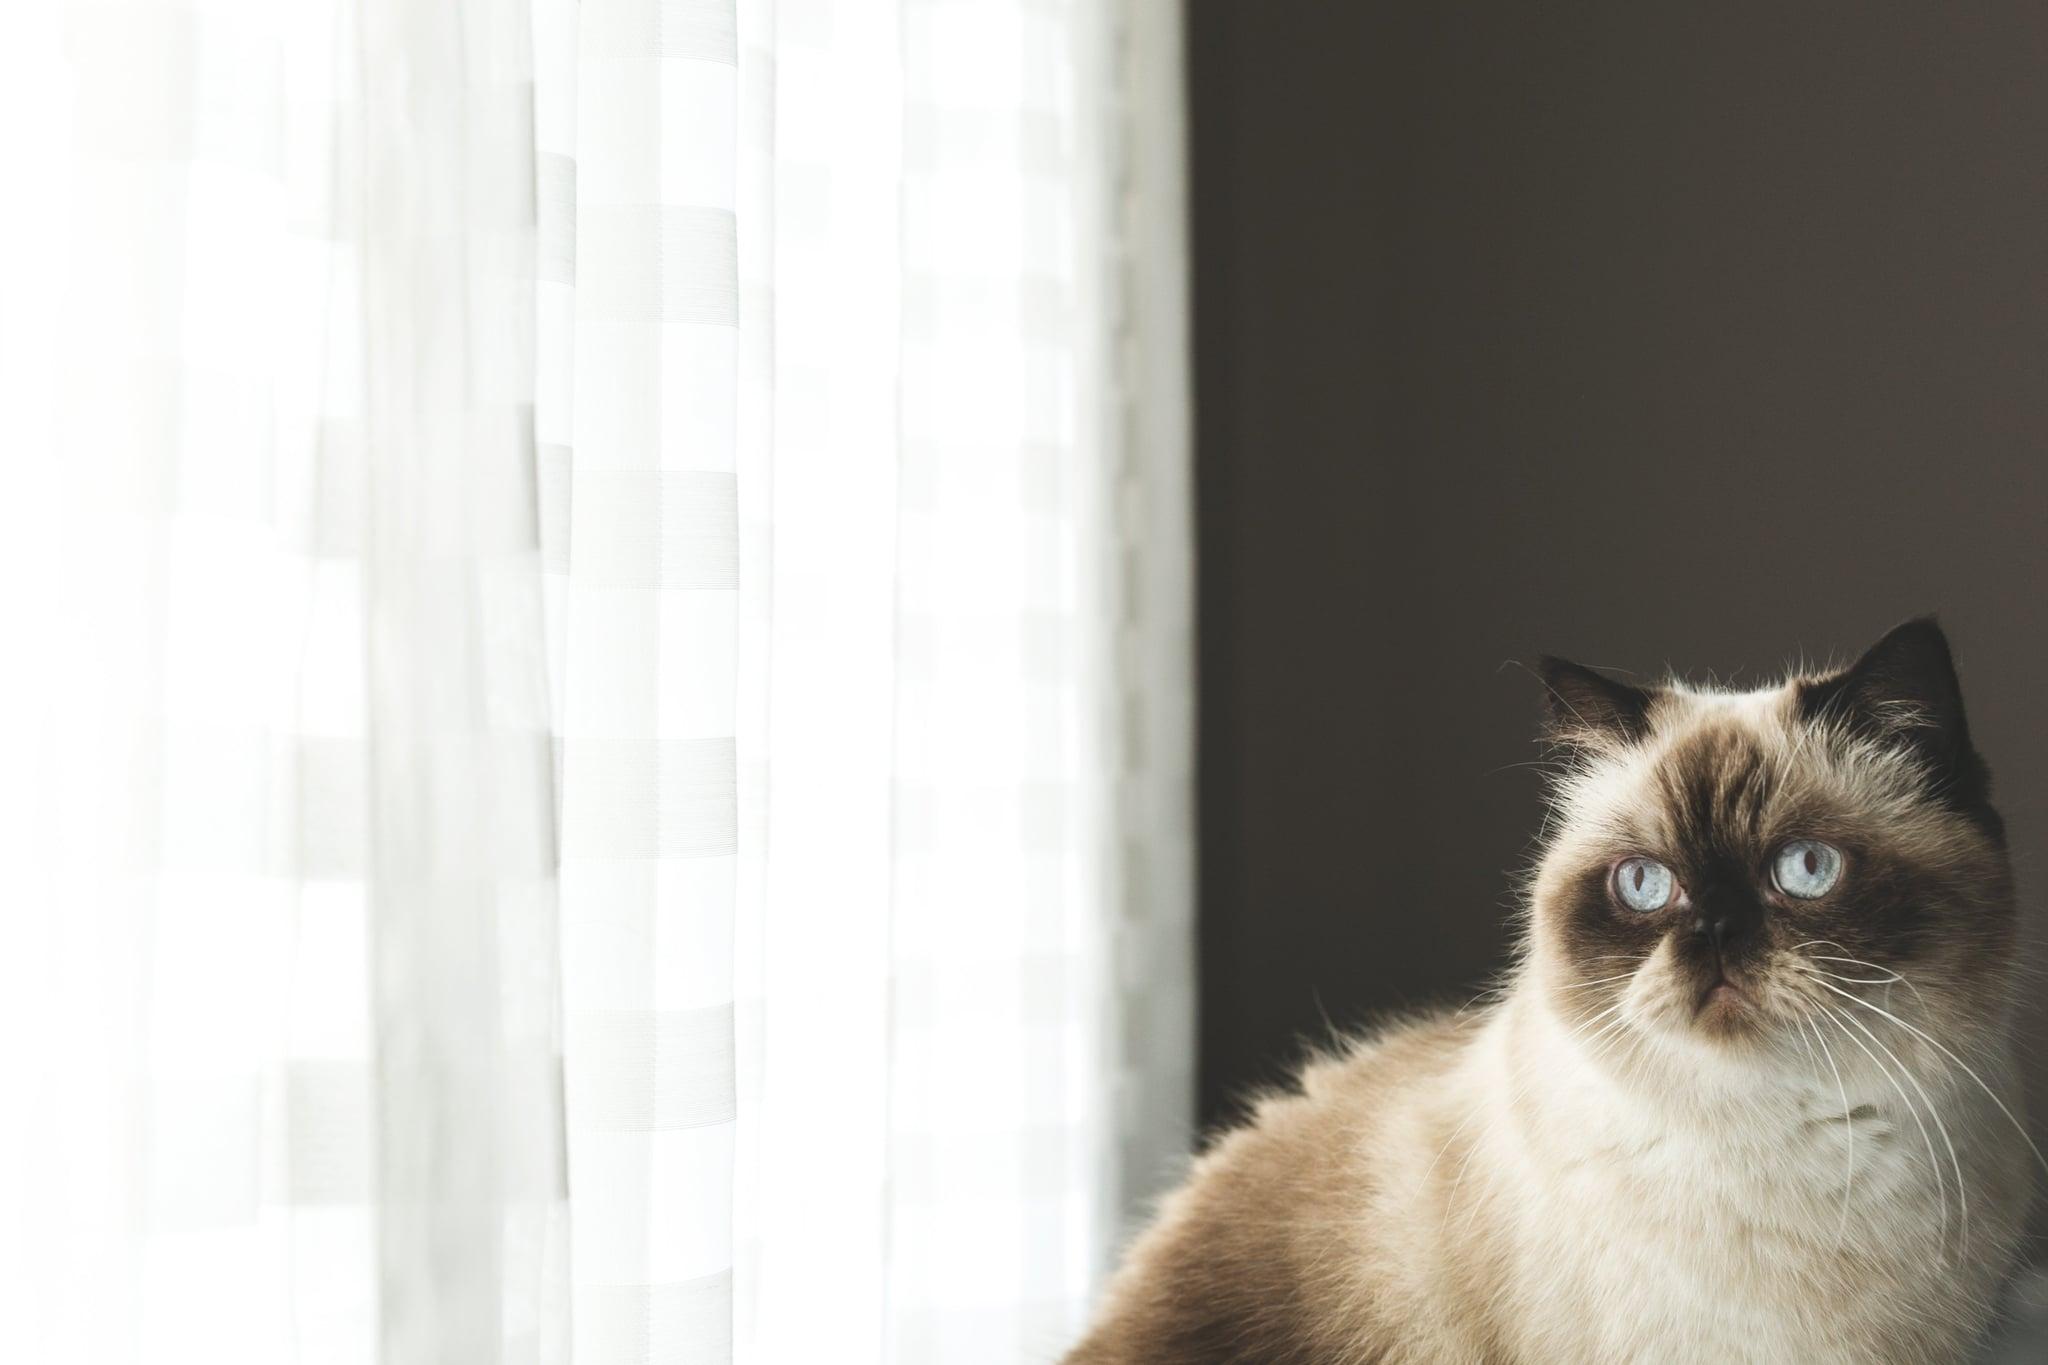 tmp_NGEoKK_907a50a8ed4cf59e_blue-eyed-persian-cat-by-window.jpg